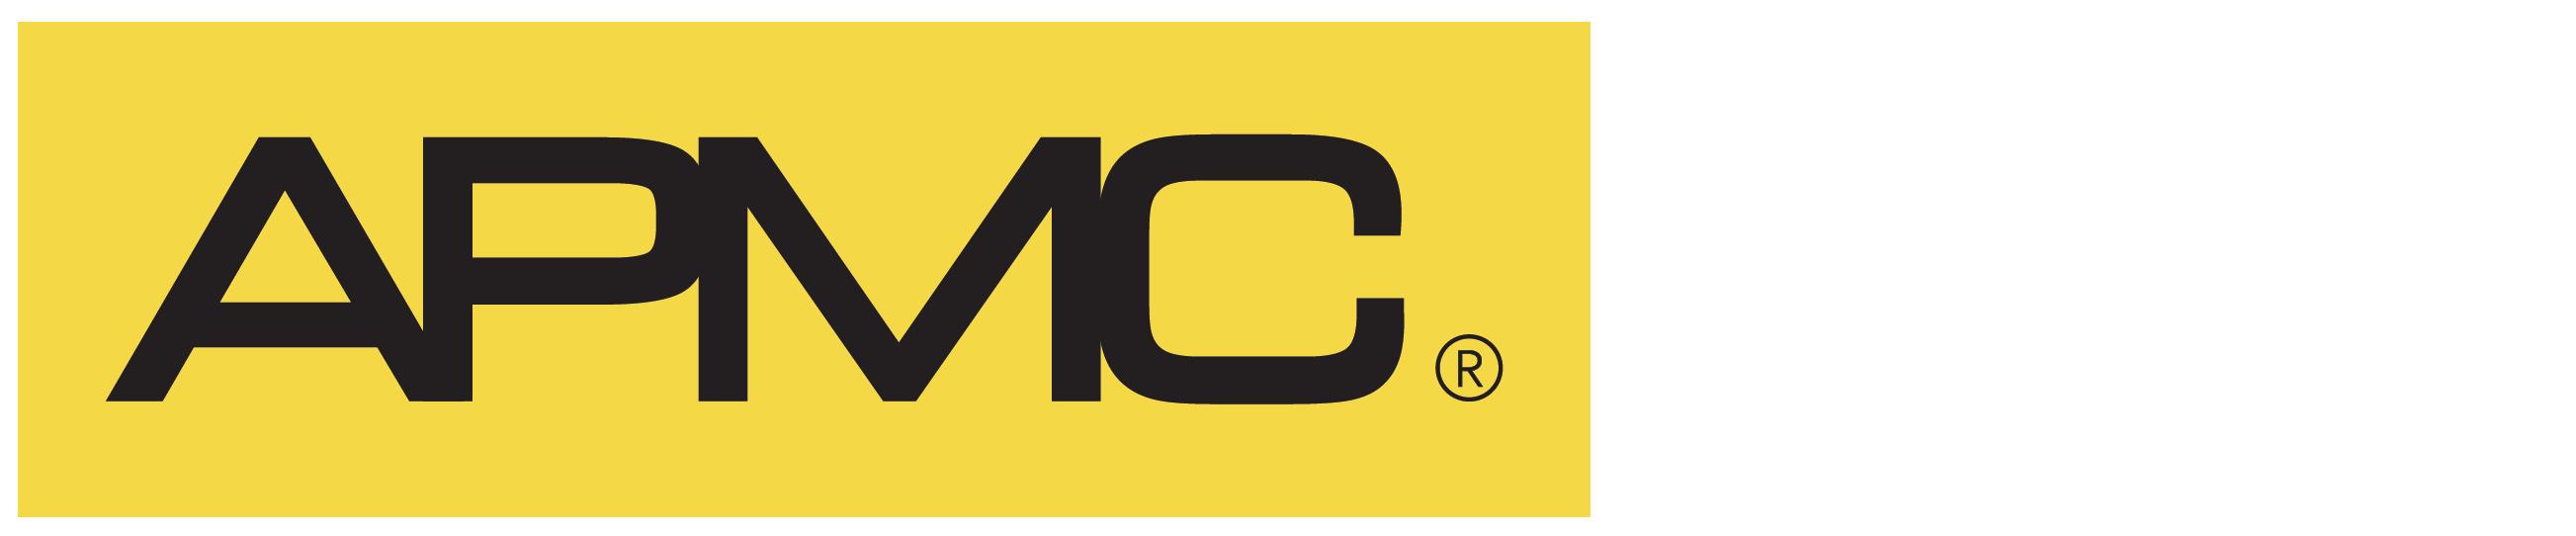 APMC (Pty) Ltd